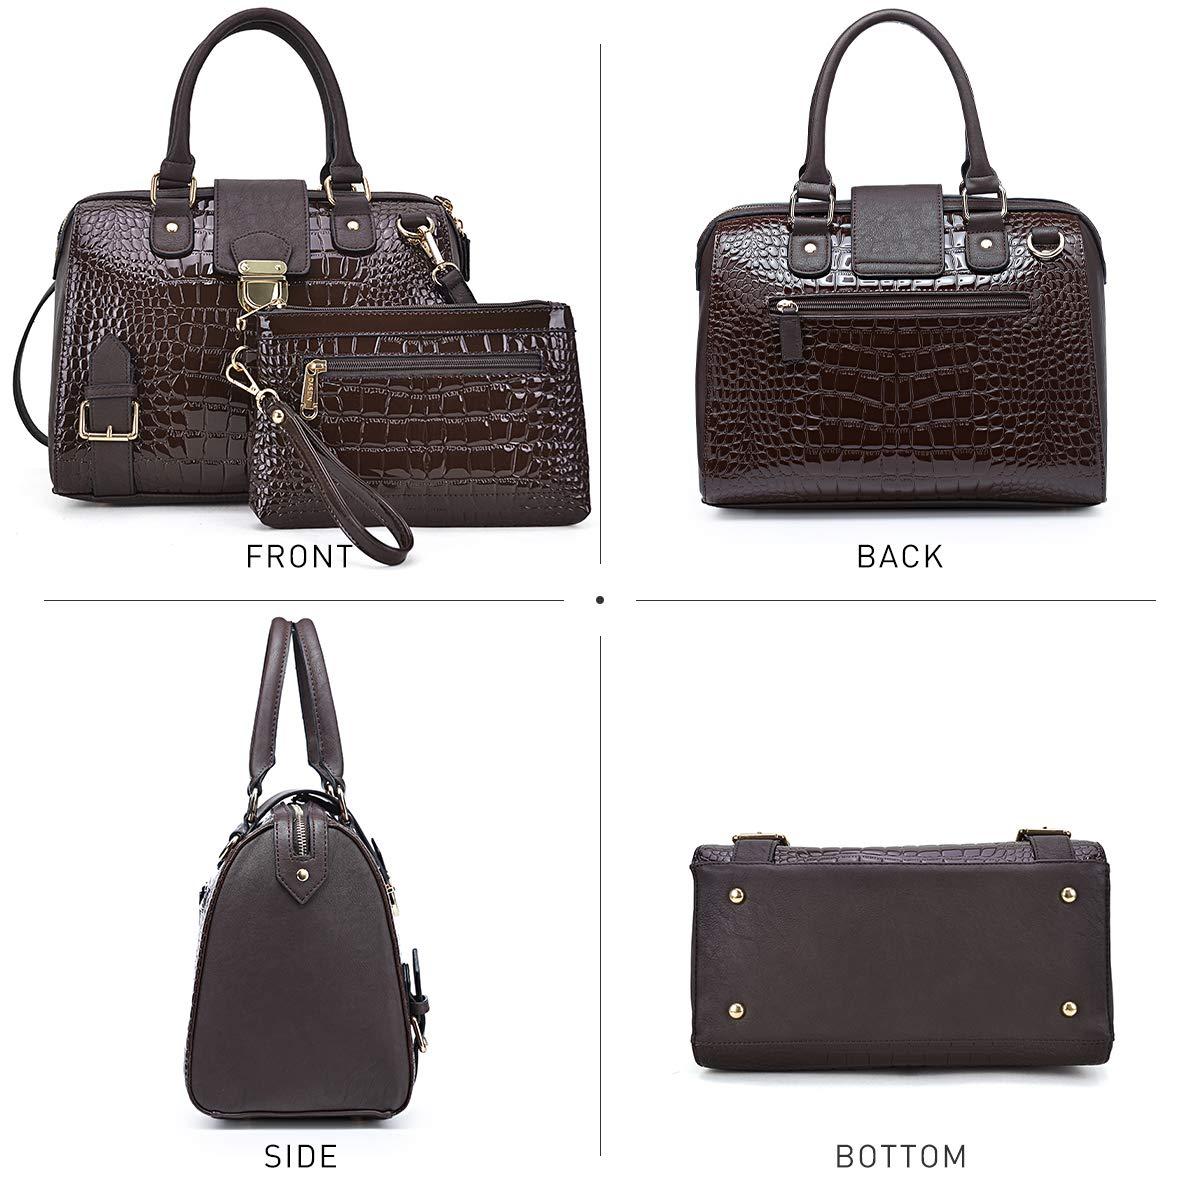 Dasein Women Barrel Handbags Purses Fashion Satchel Bags Top Handle Shoulder Bags Vegan Leather Tote Bags by Dasein (Image #3)